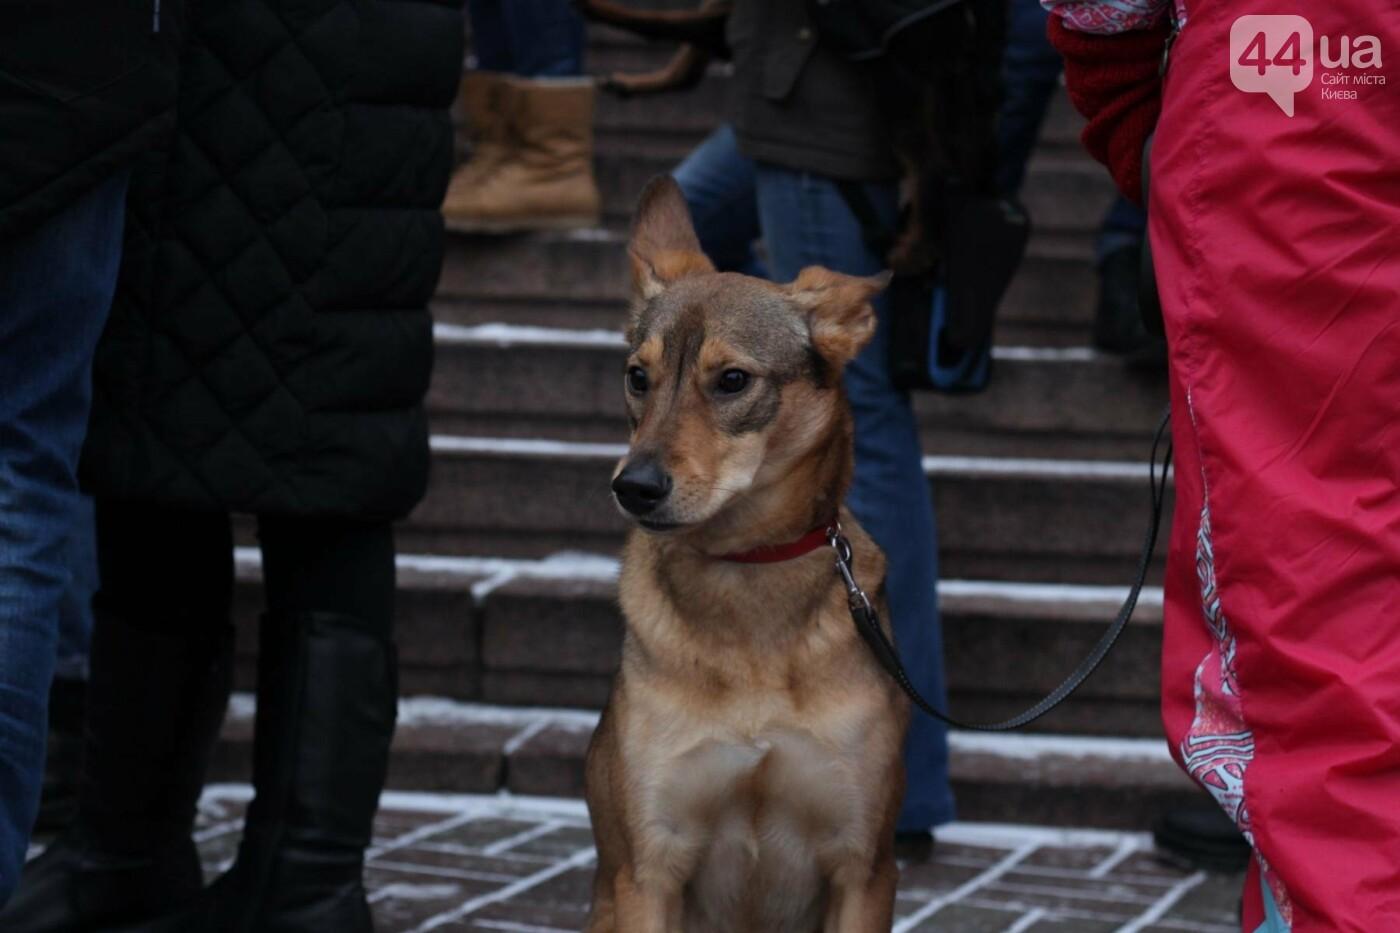 Цирк без животных: как в Киеве прошла акция протеста, фото-14